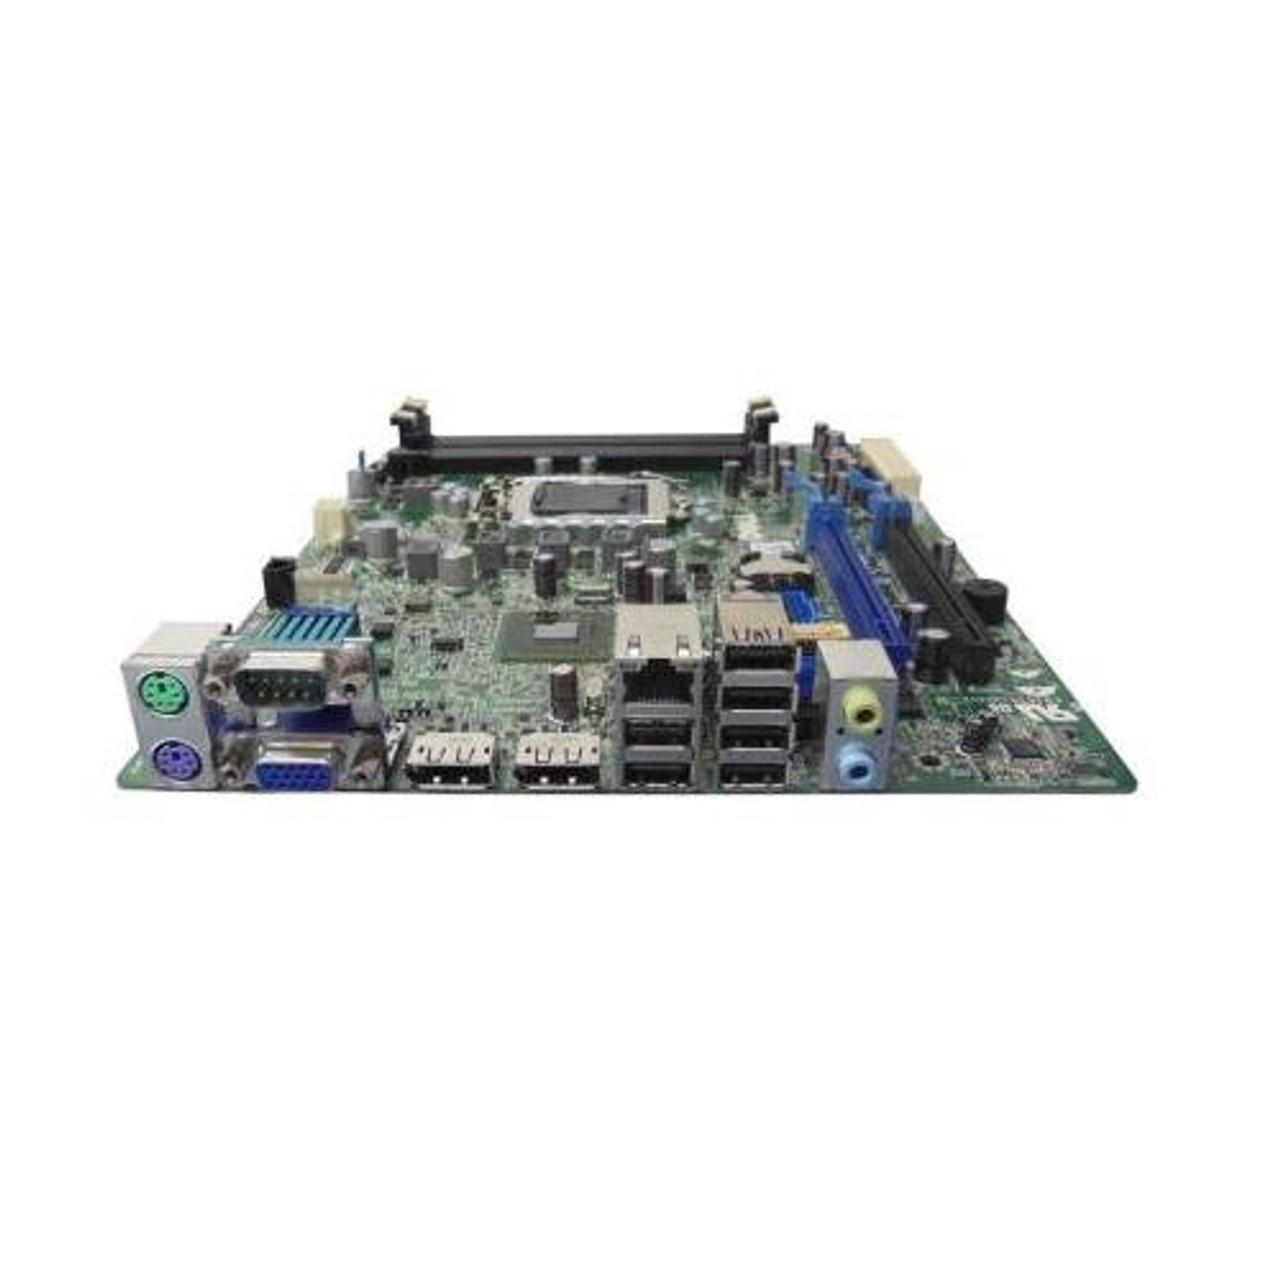 F3KHR Dell System Board LGA1155 W/o CPU OptiPlex 9010 Tower (Refurbished)